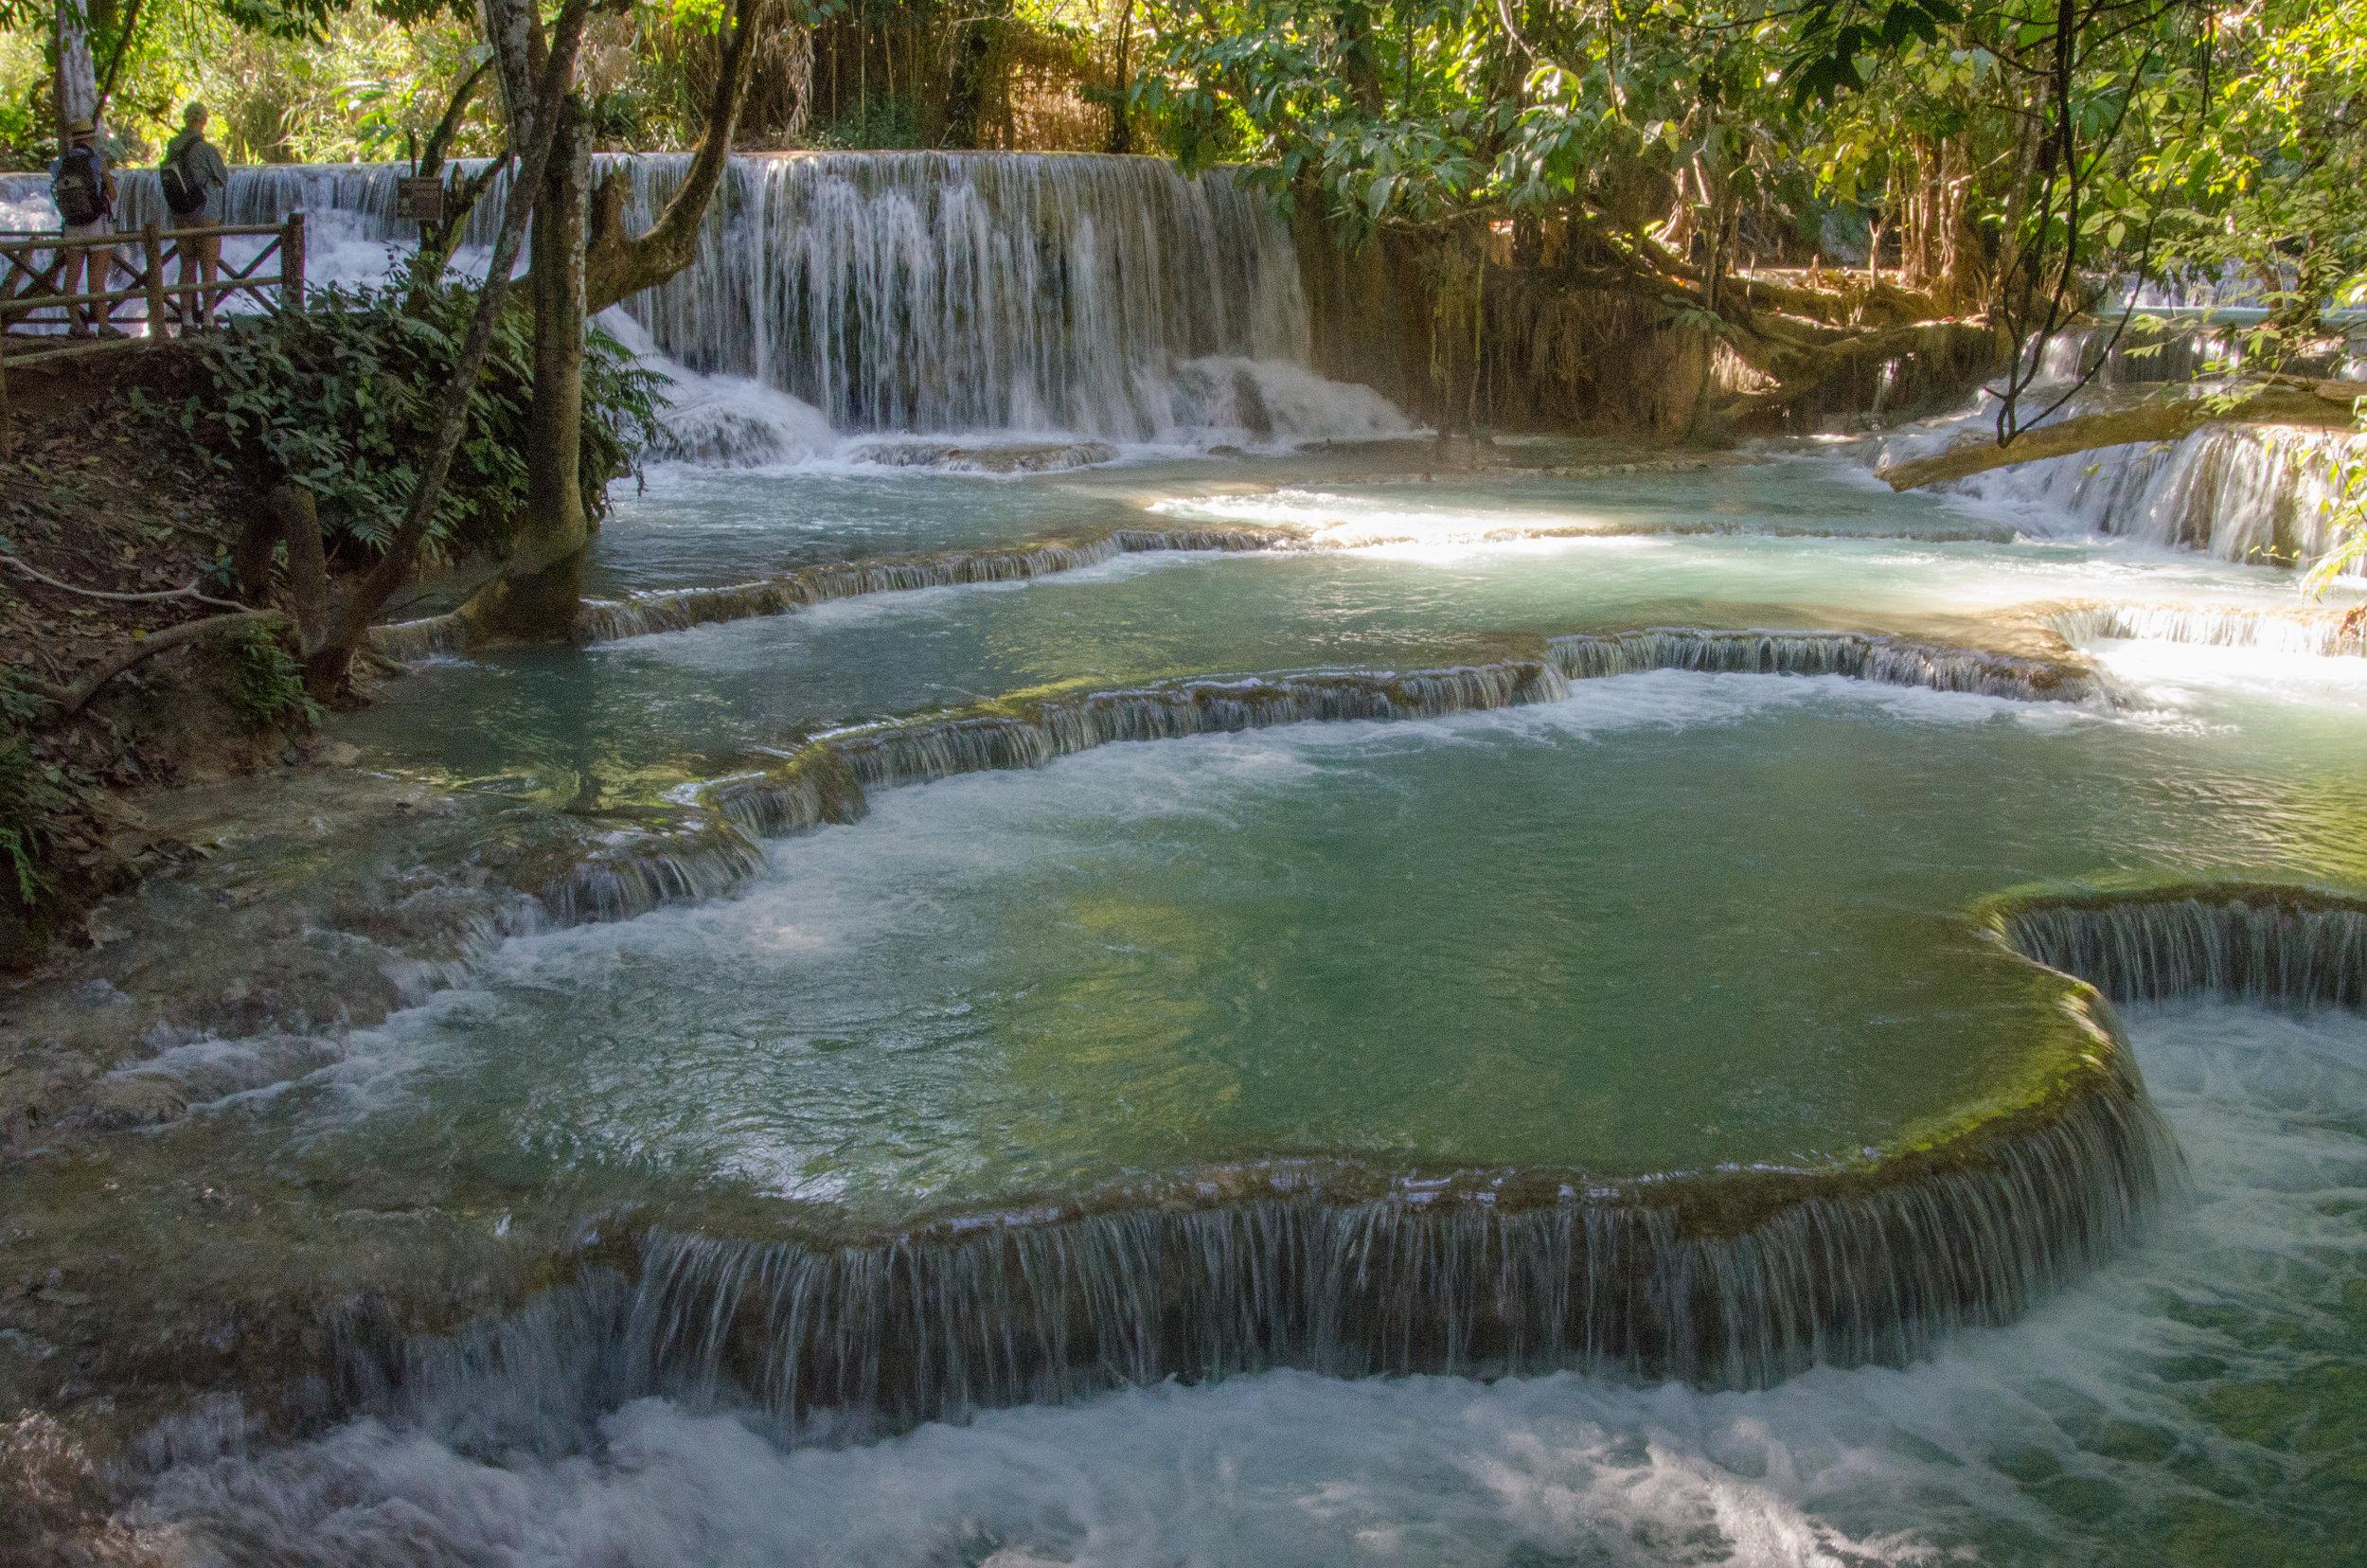 Tat Kouang Si Waterfalls, Luang Prabang, Laos